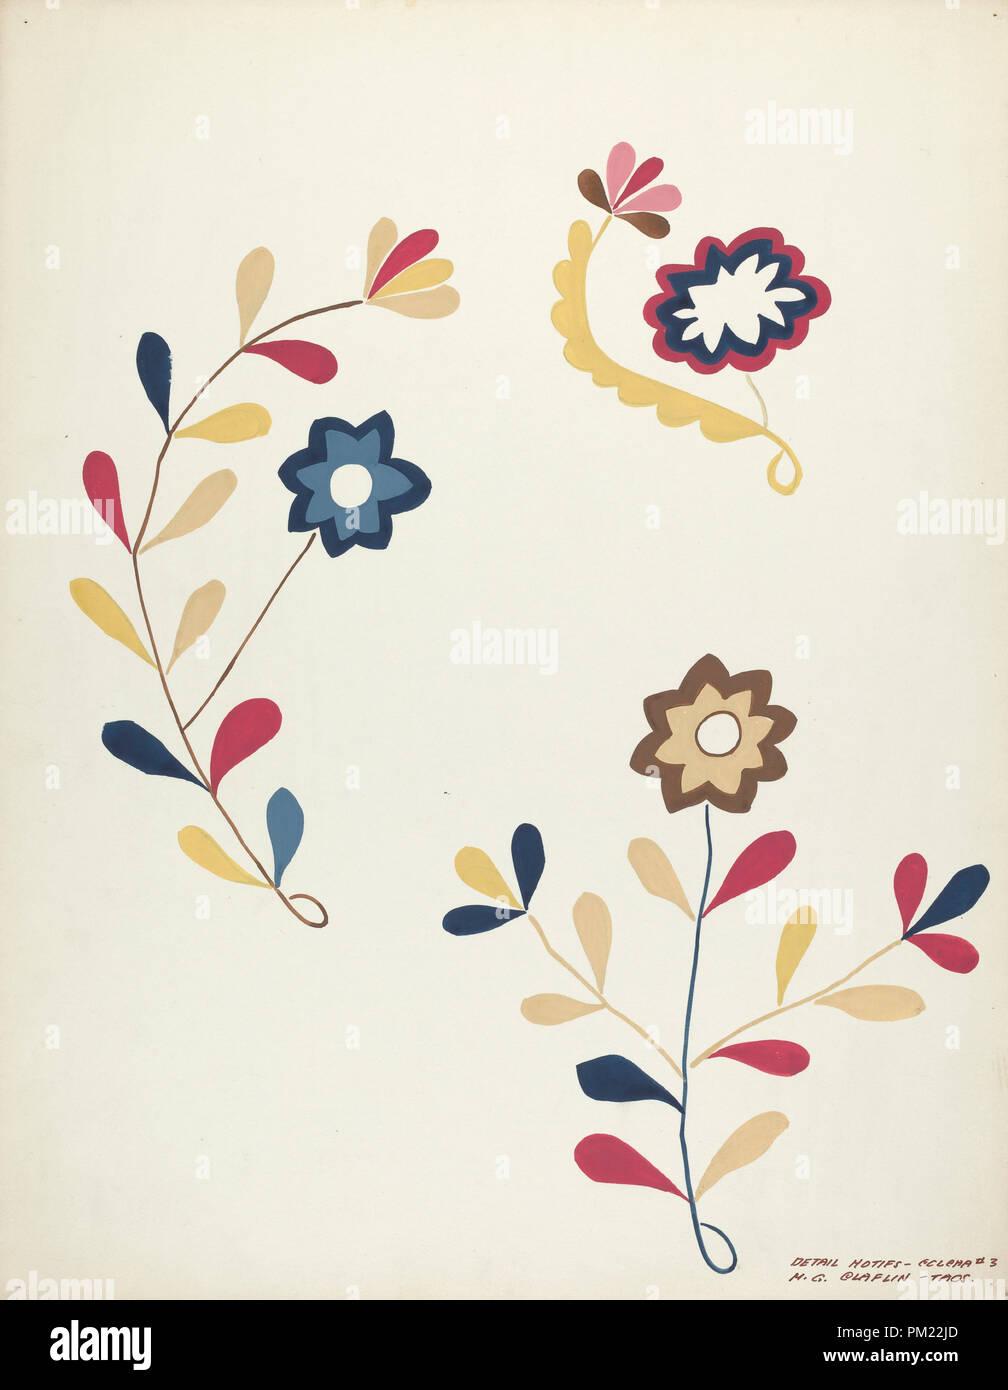 Design from Proposed Portfolio  Dated: 1935/1942  Dimensions